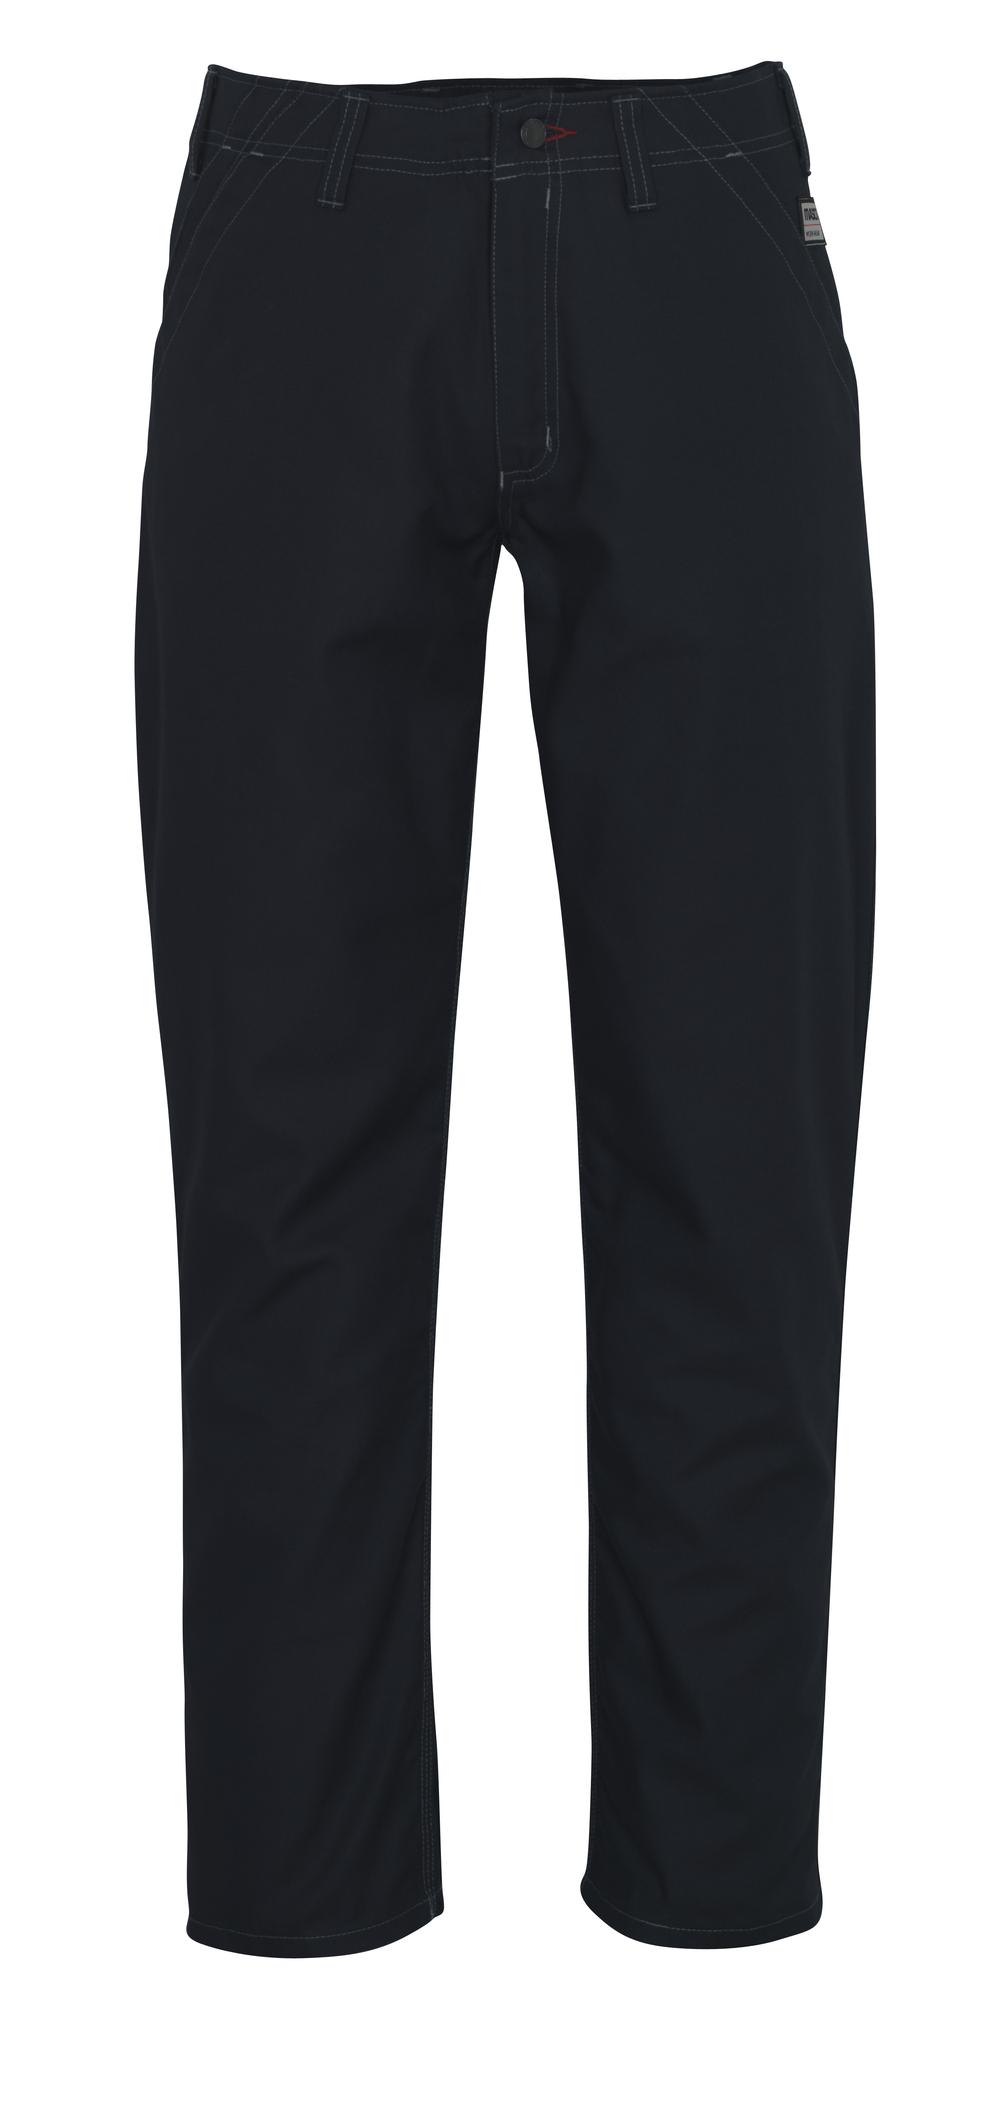 09279-154-010 Trousers - dark navy